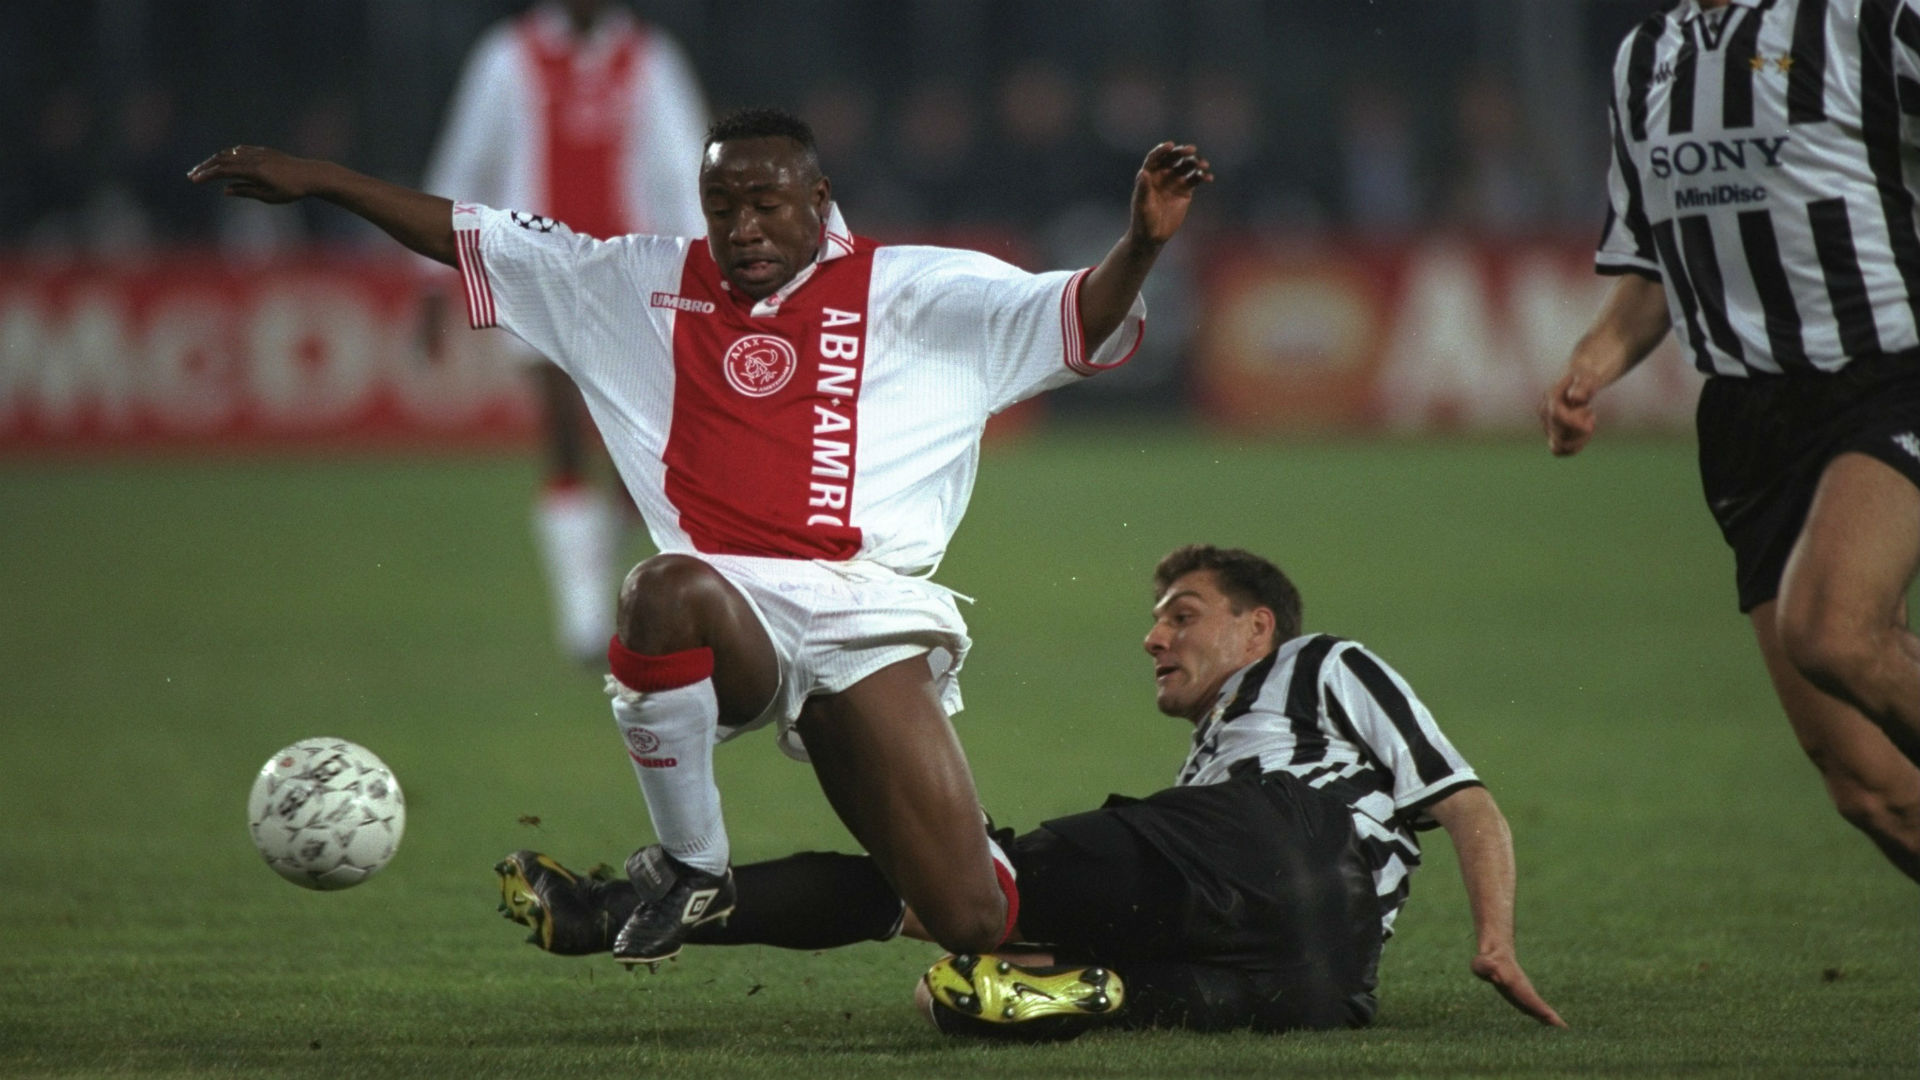 Babangida: Tough Louis van Gaal is my best coach - Ex-Nigeria winger on Ajax legend